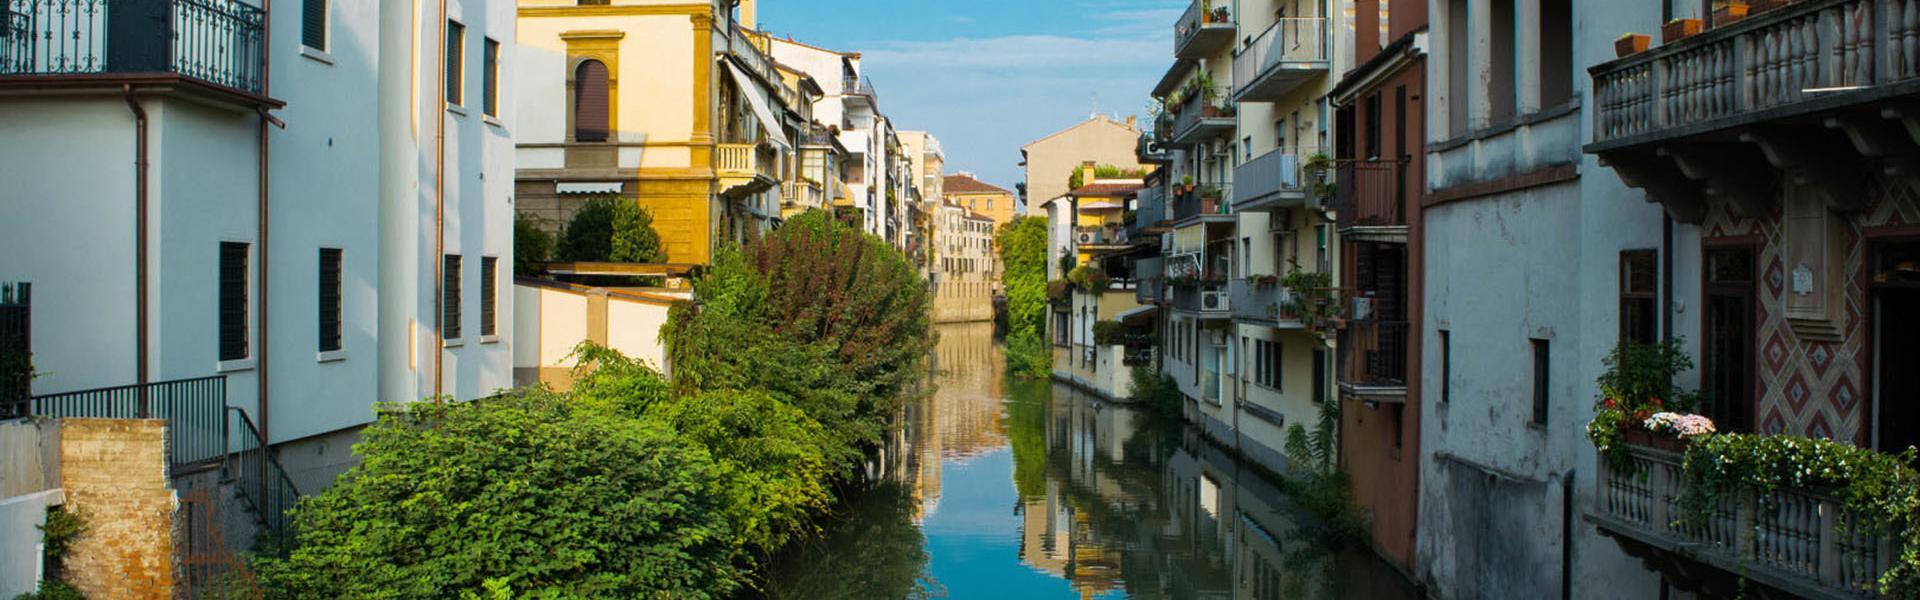 Padova Travel Vie d'acqua ©Alan Trovo